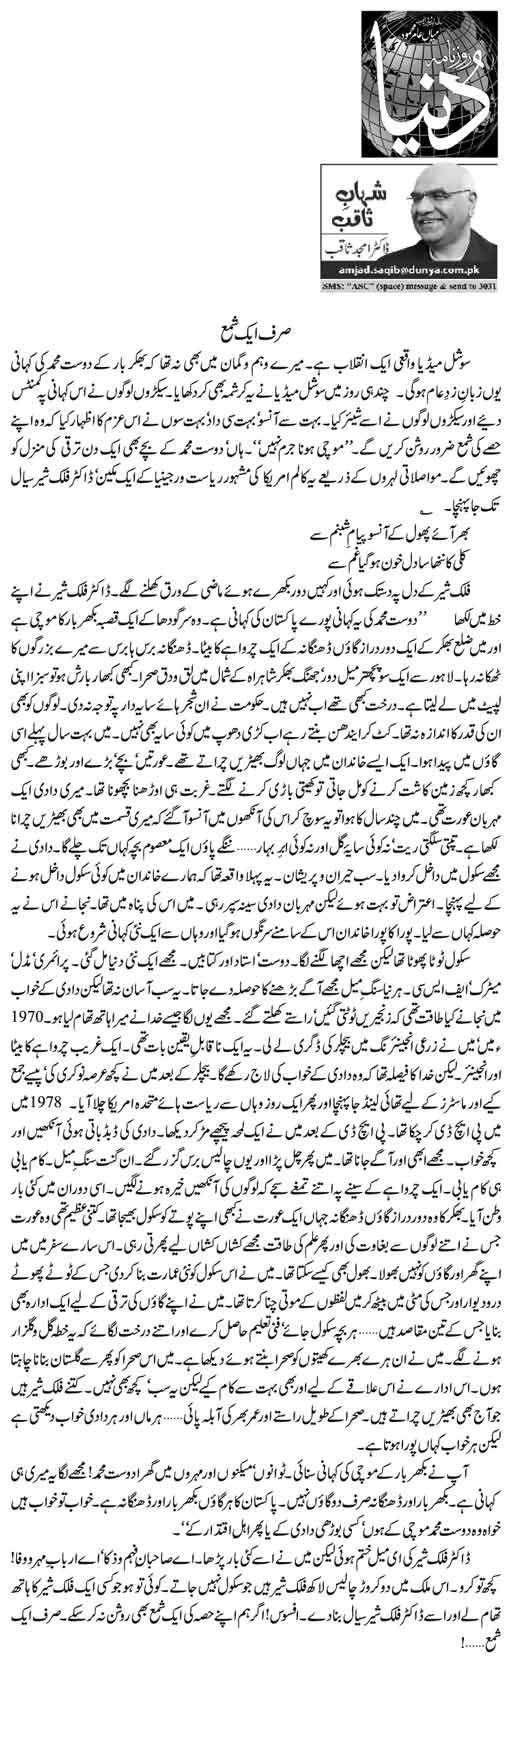 Sirf Aik Shama | Dr. Amjad Saqib | Daily Urdu Columns